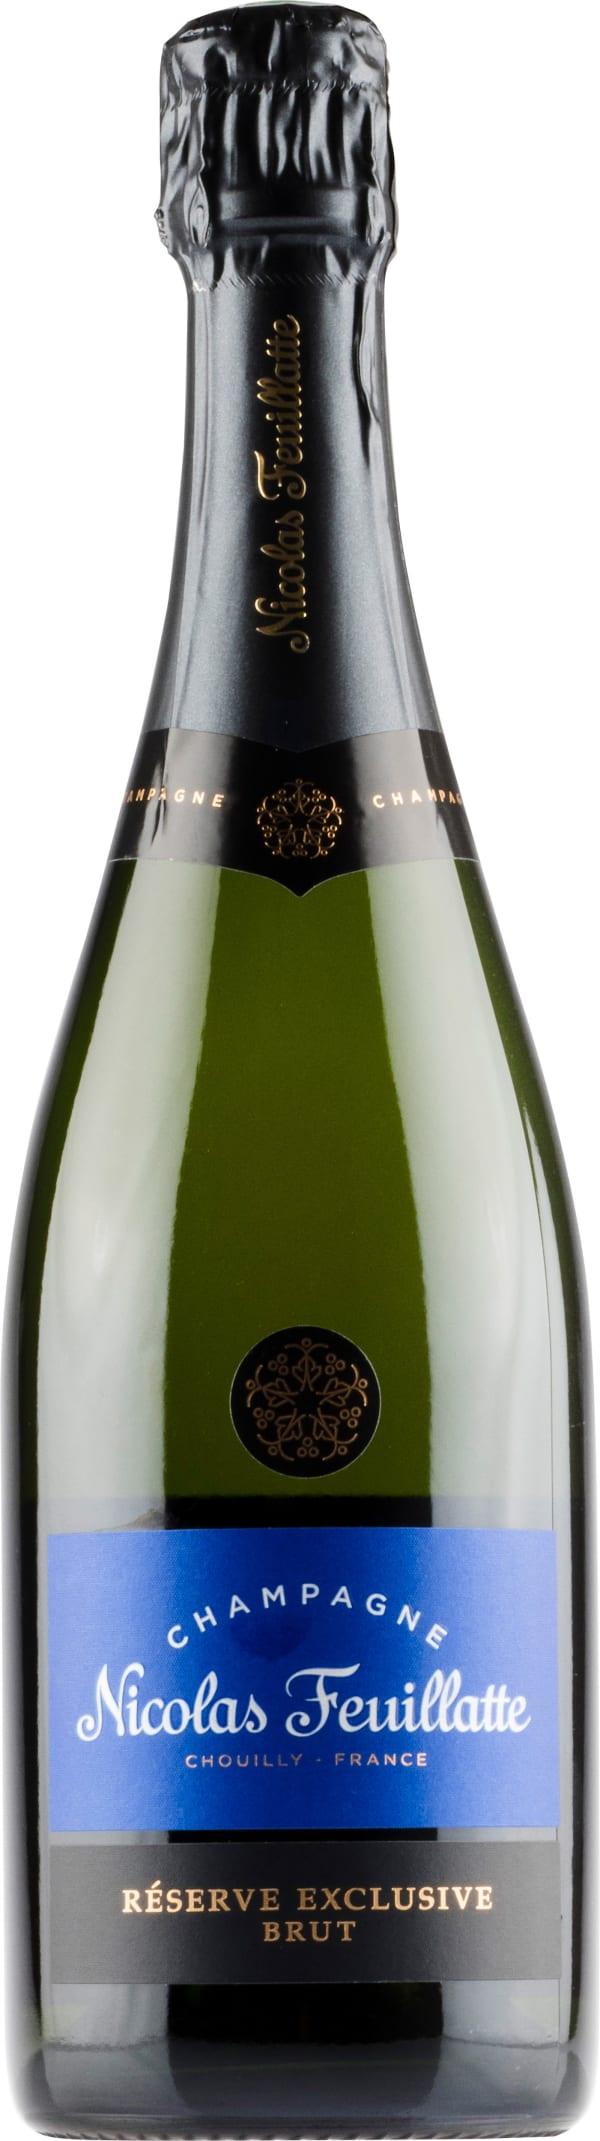 Nicolas Feuillatte Réserve Exclusive Champagne Brut presentförpackning